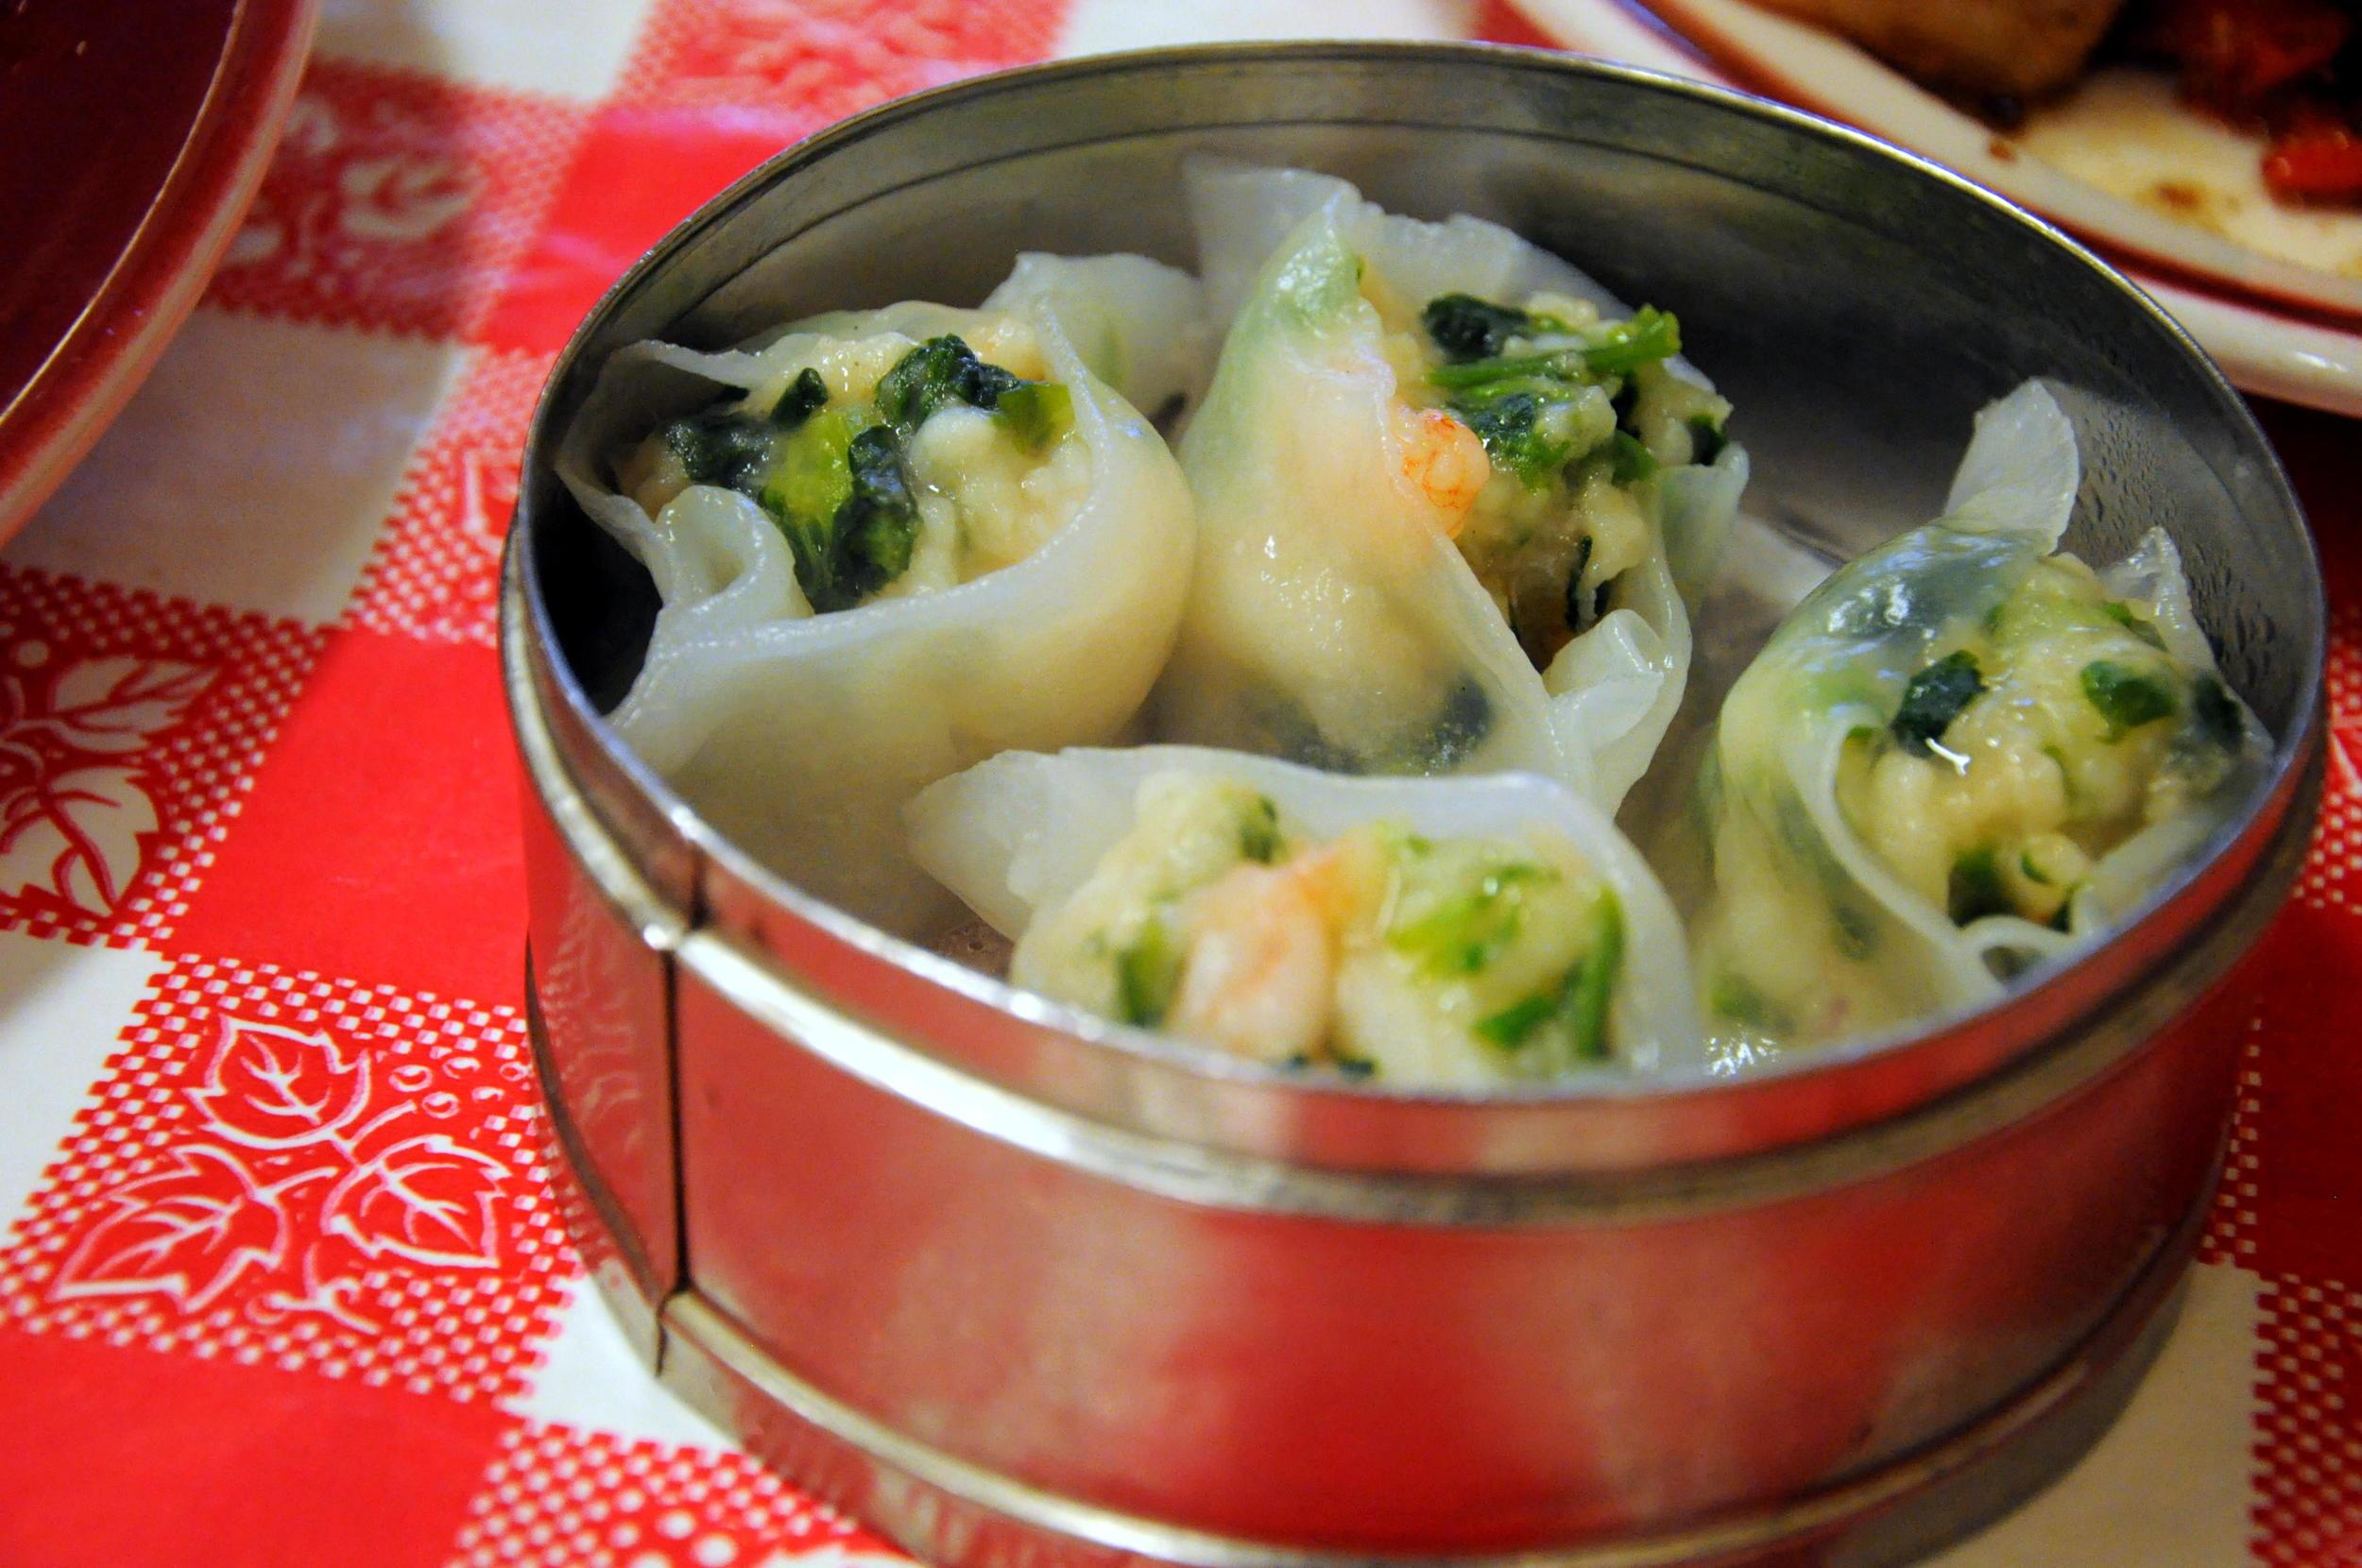 Shrimp and snow pea leaf dumplings at Nom Wah Tea Parlor